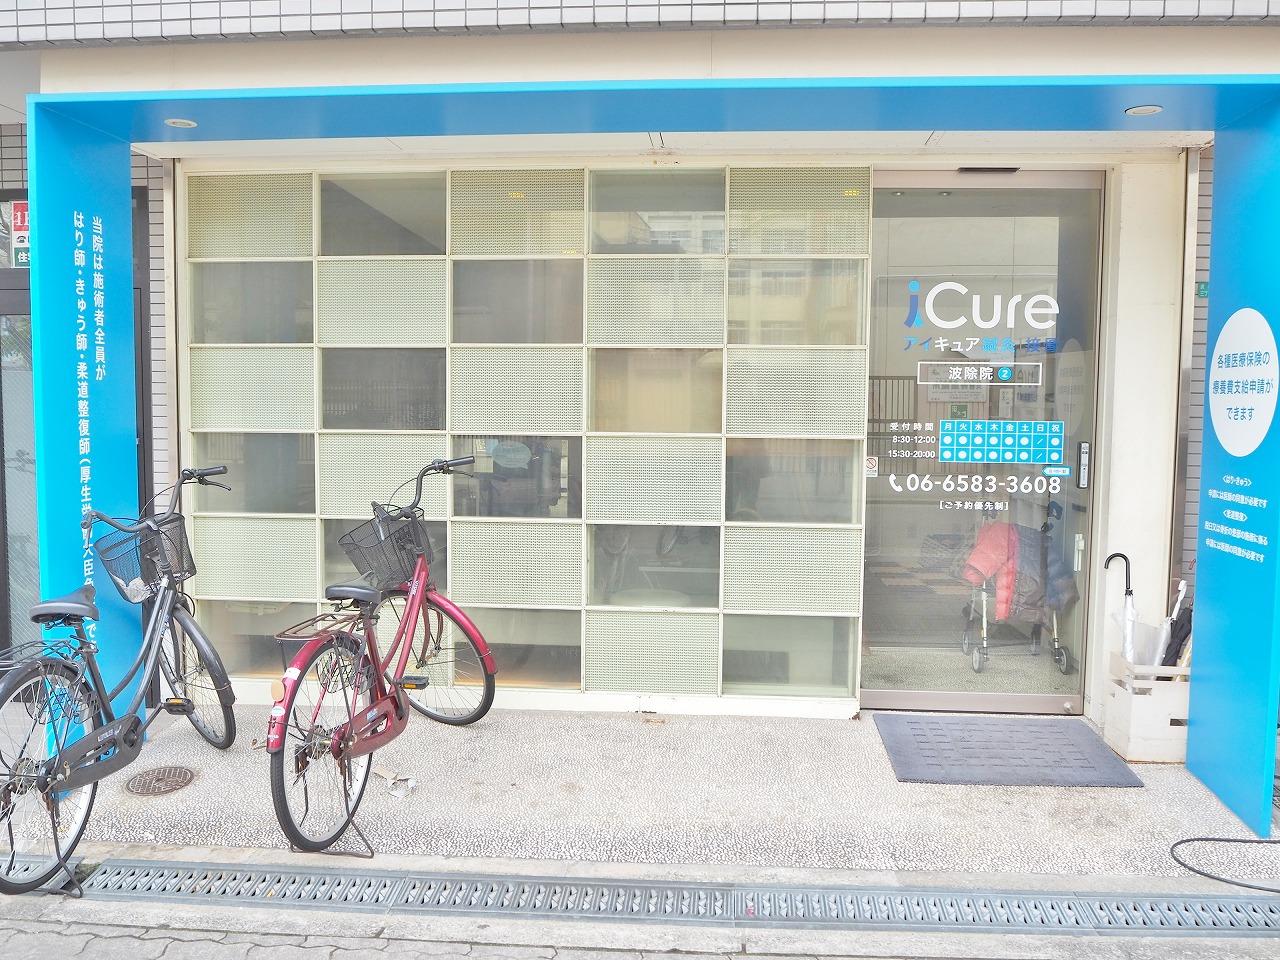 iCure鍼灸接骨院 波除